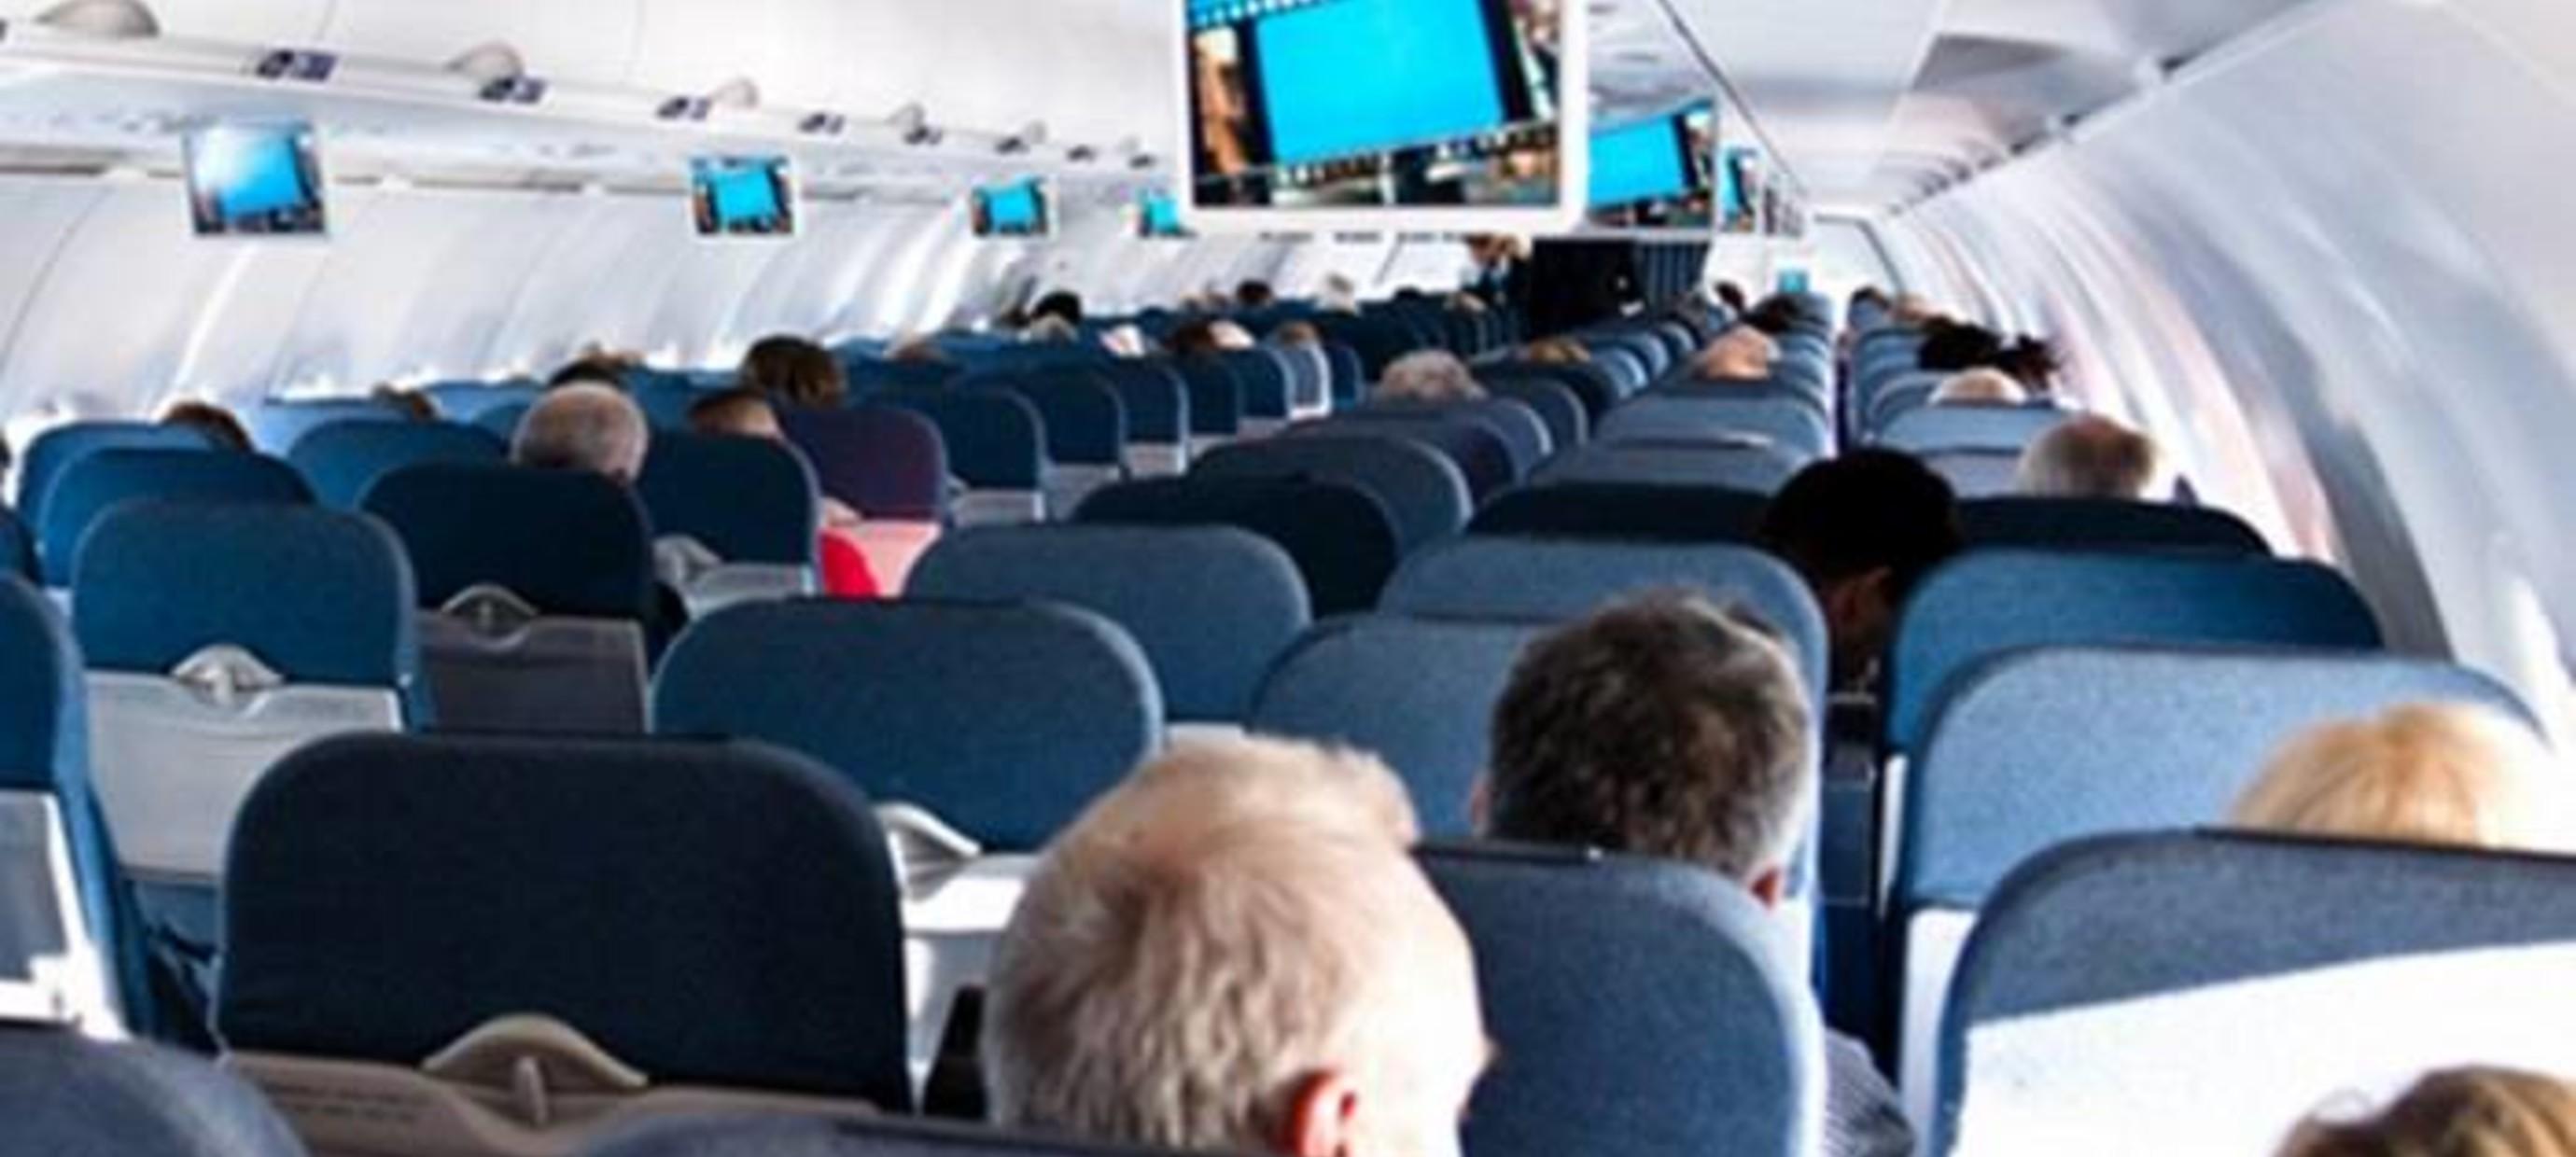 E-Zigarette im Flugzeug – ein heikles Thema